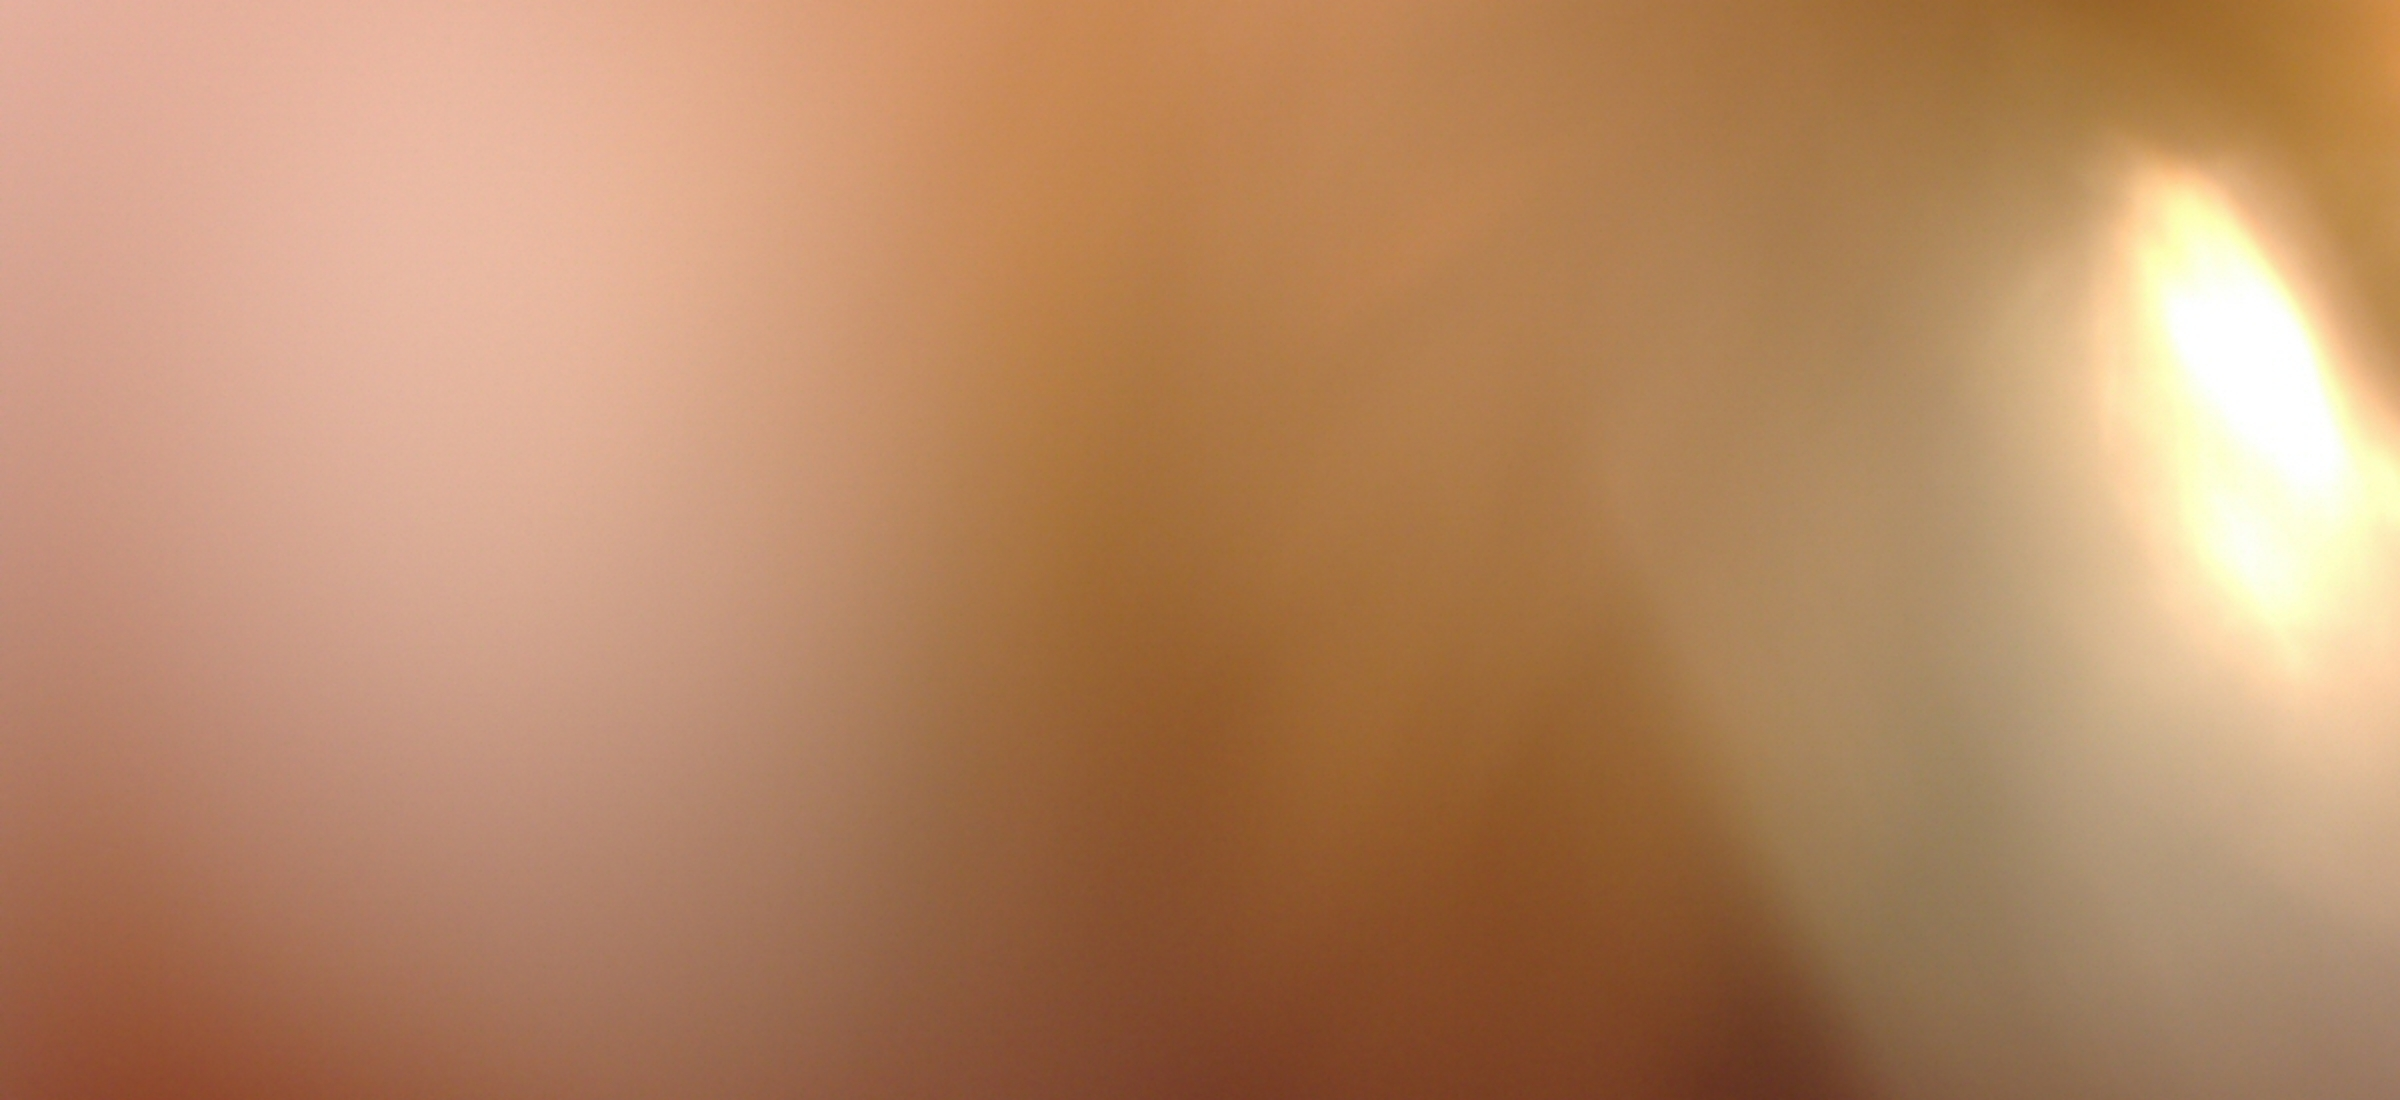 orangey_gold_glow_by_bombstock